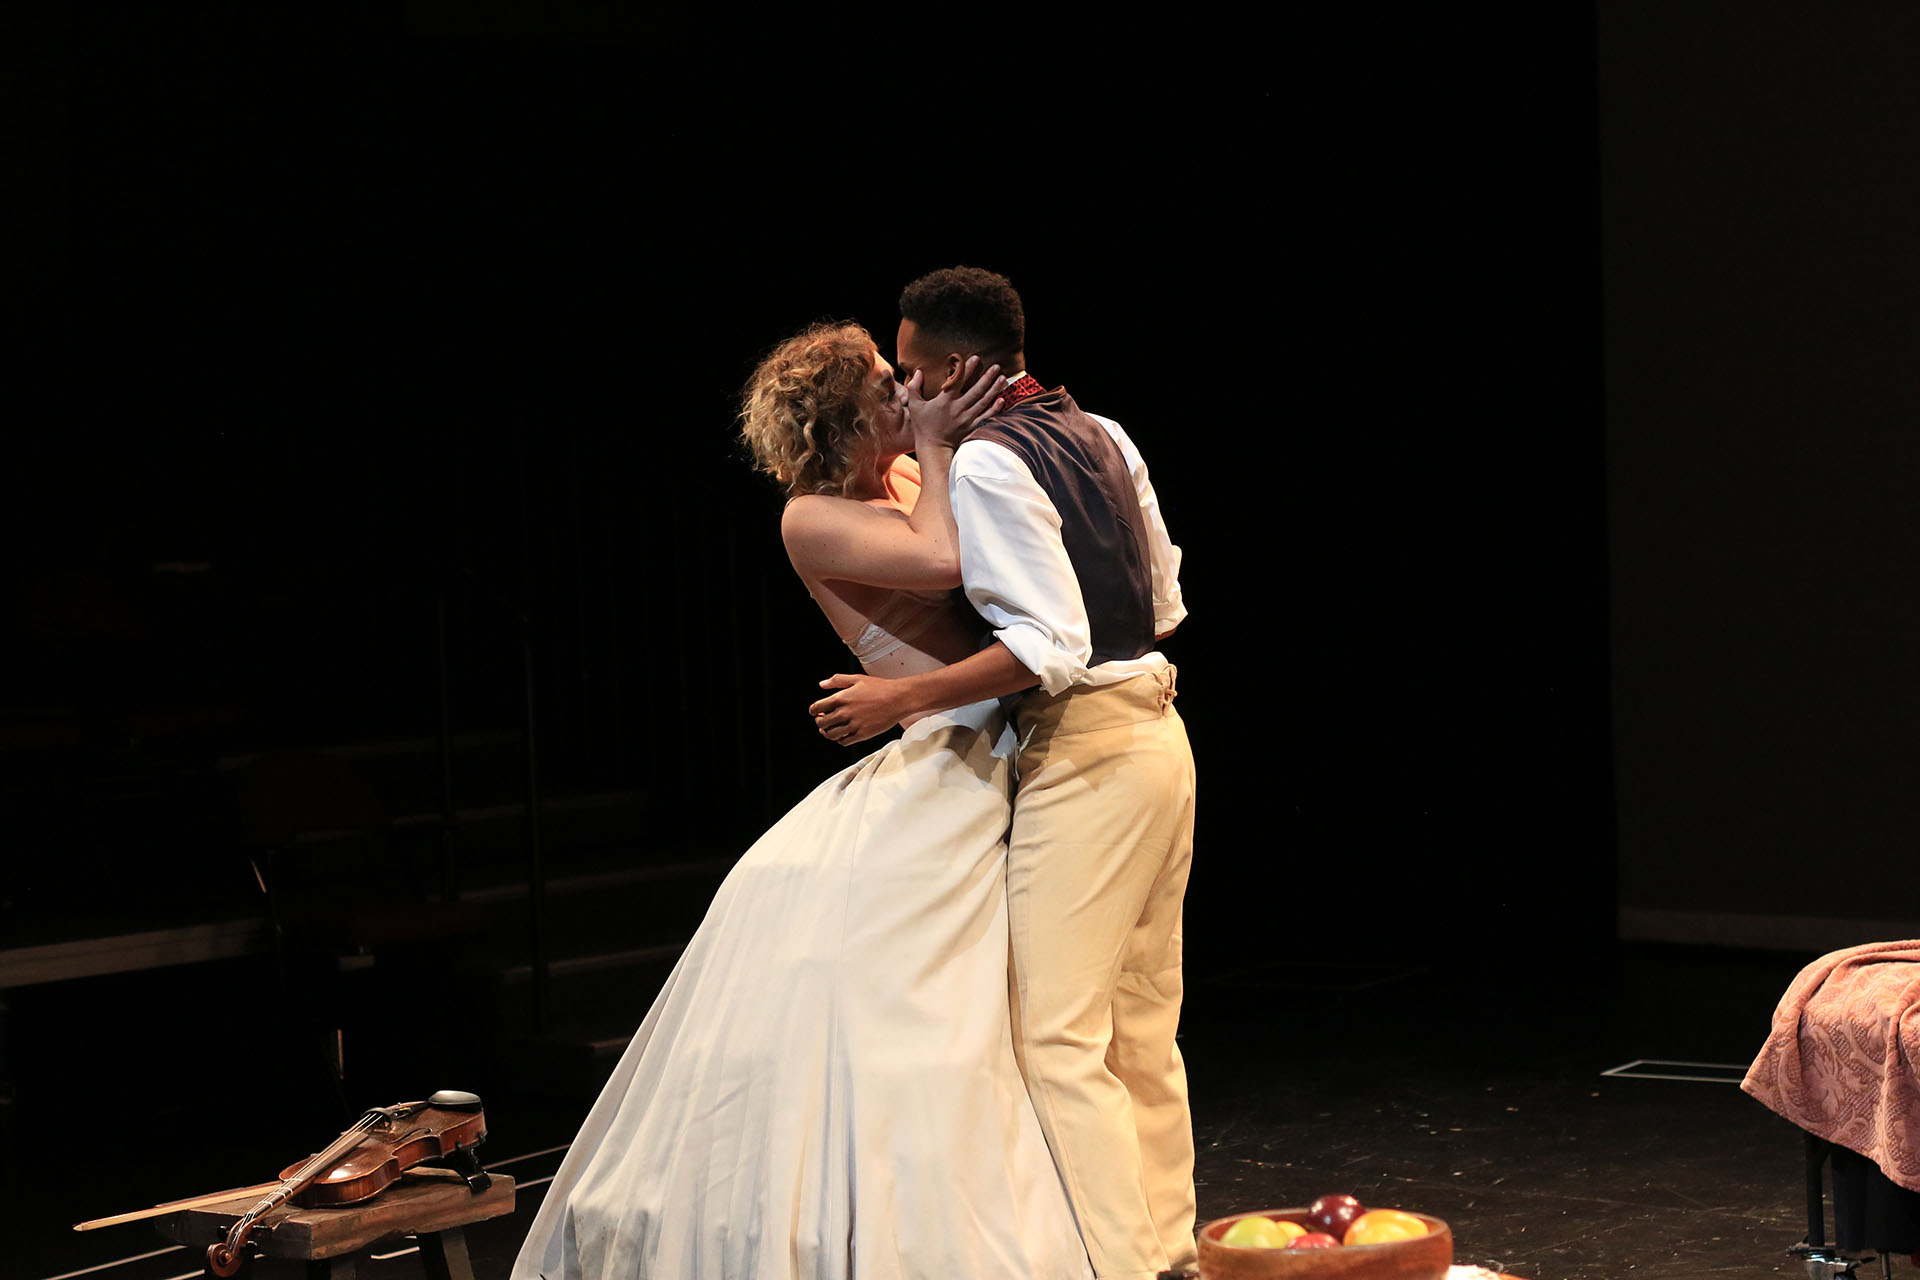 Marié Botha ('18) and Erron Crawford ('19) in SLAVE PLAY by Jeremy O. Harris ('19), directed by Em Weinstein ('19). Yale School of Drama, 2017. Photo by Elsa GibsonBraden ('20).